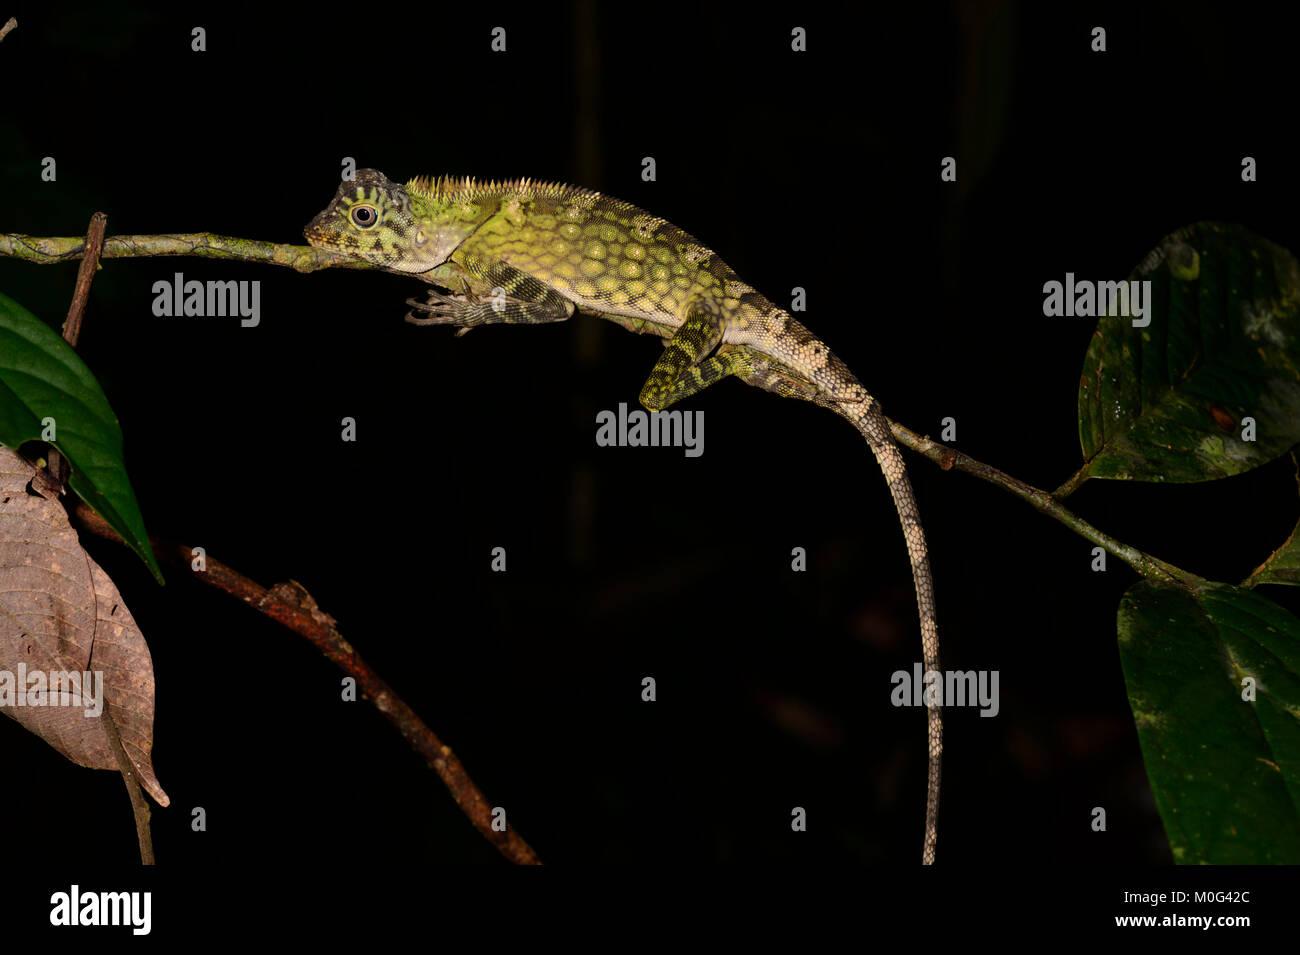 Bornean Angle-headed Dragon or Agamid lizard (Gonocephalus bornensis), Danum Valley Conservation Area, Borneo, Sabah, - Stock Image